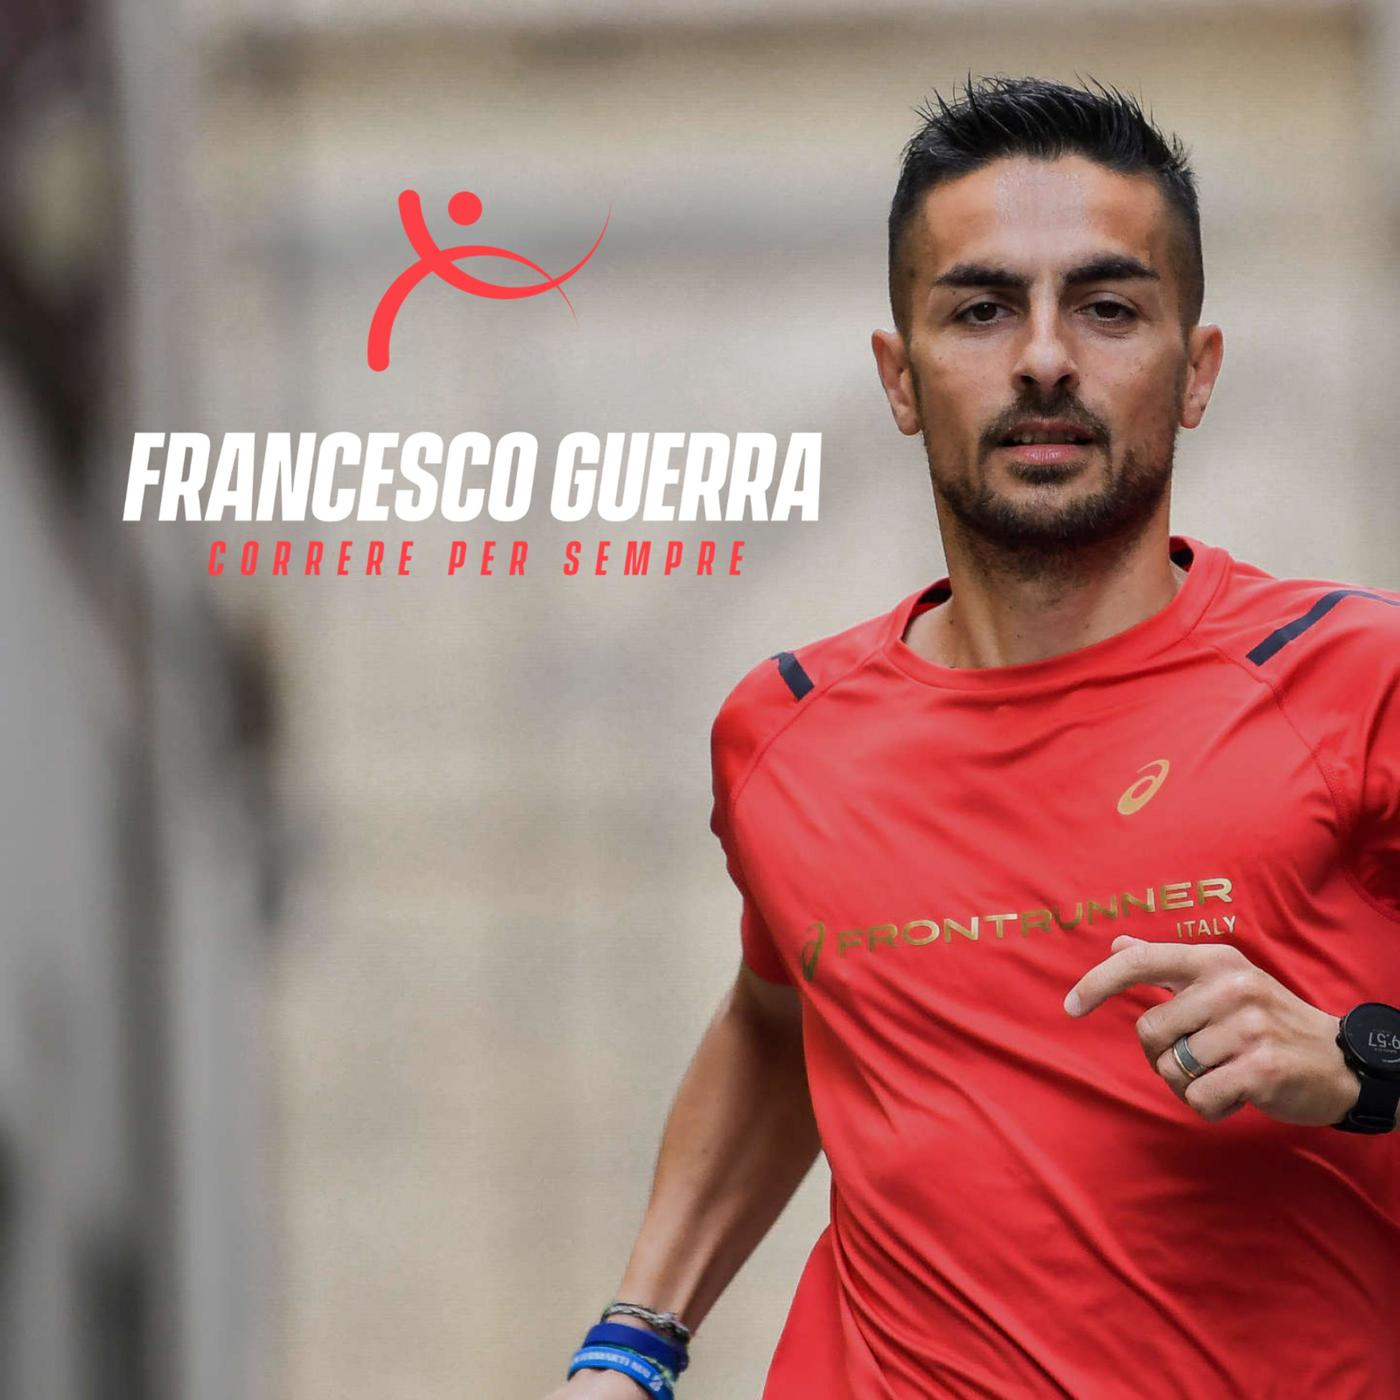 Francesco Guerra foto personale di corsa